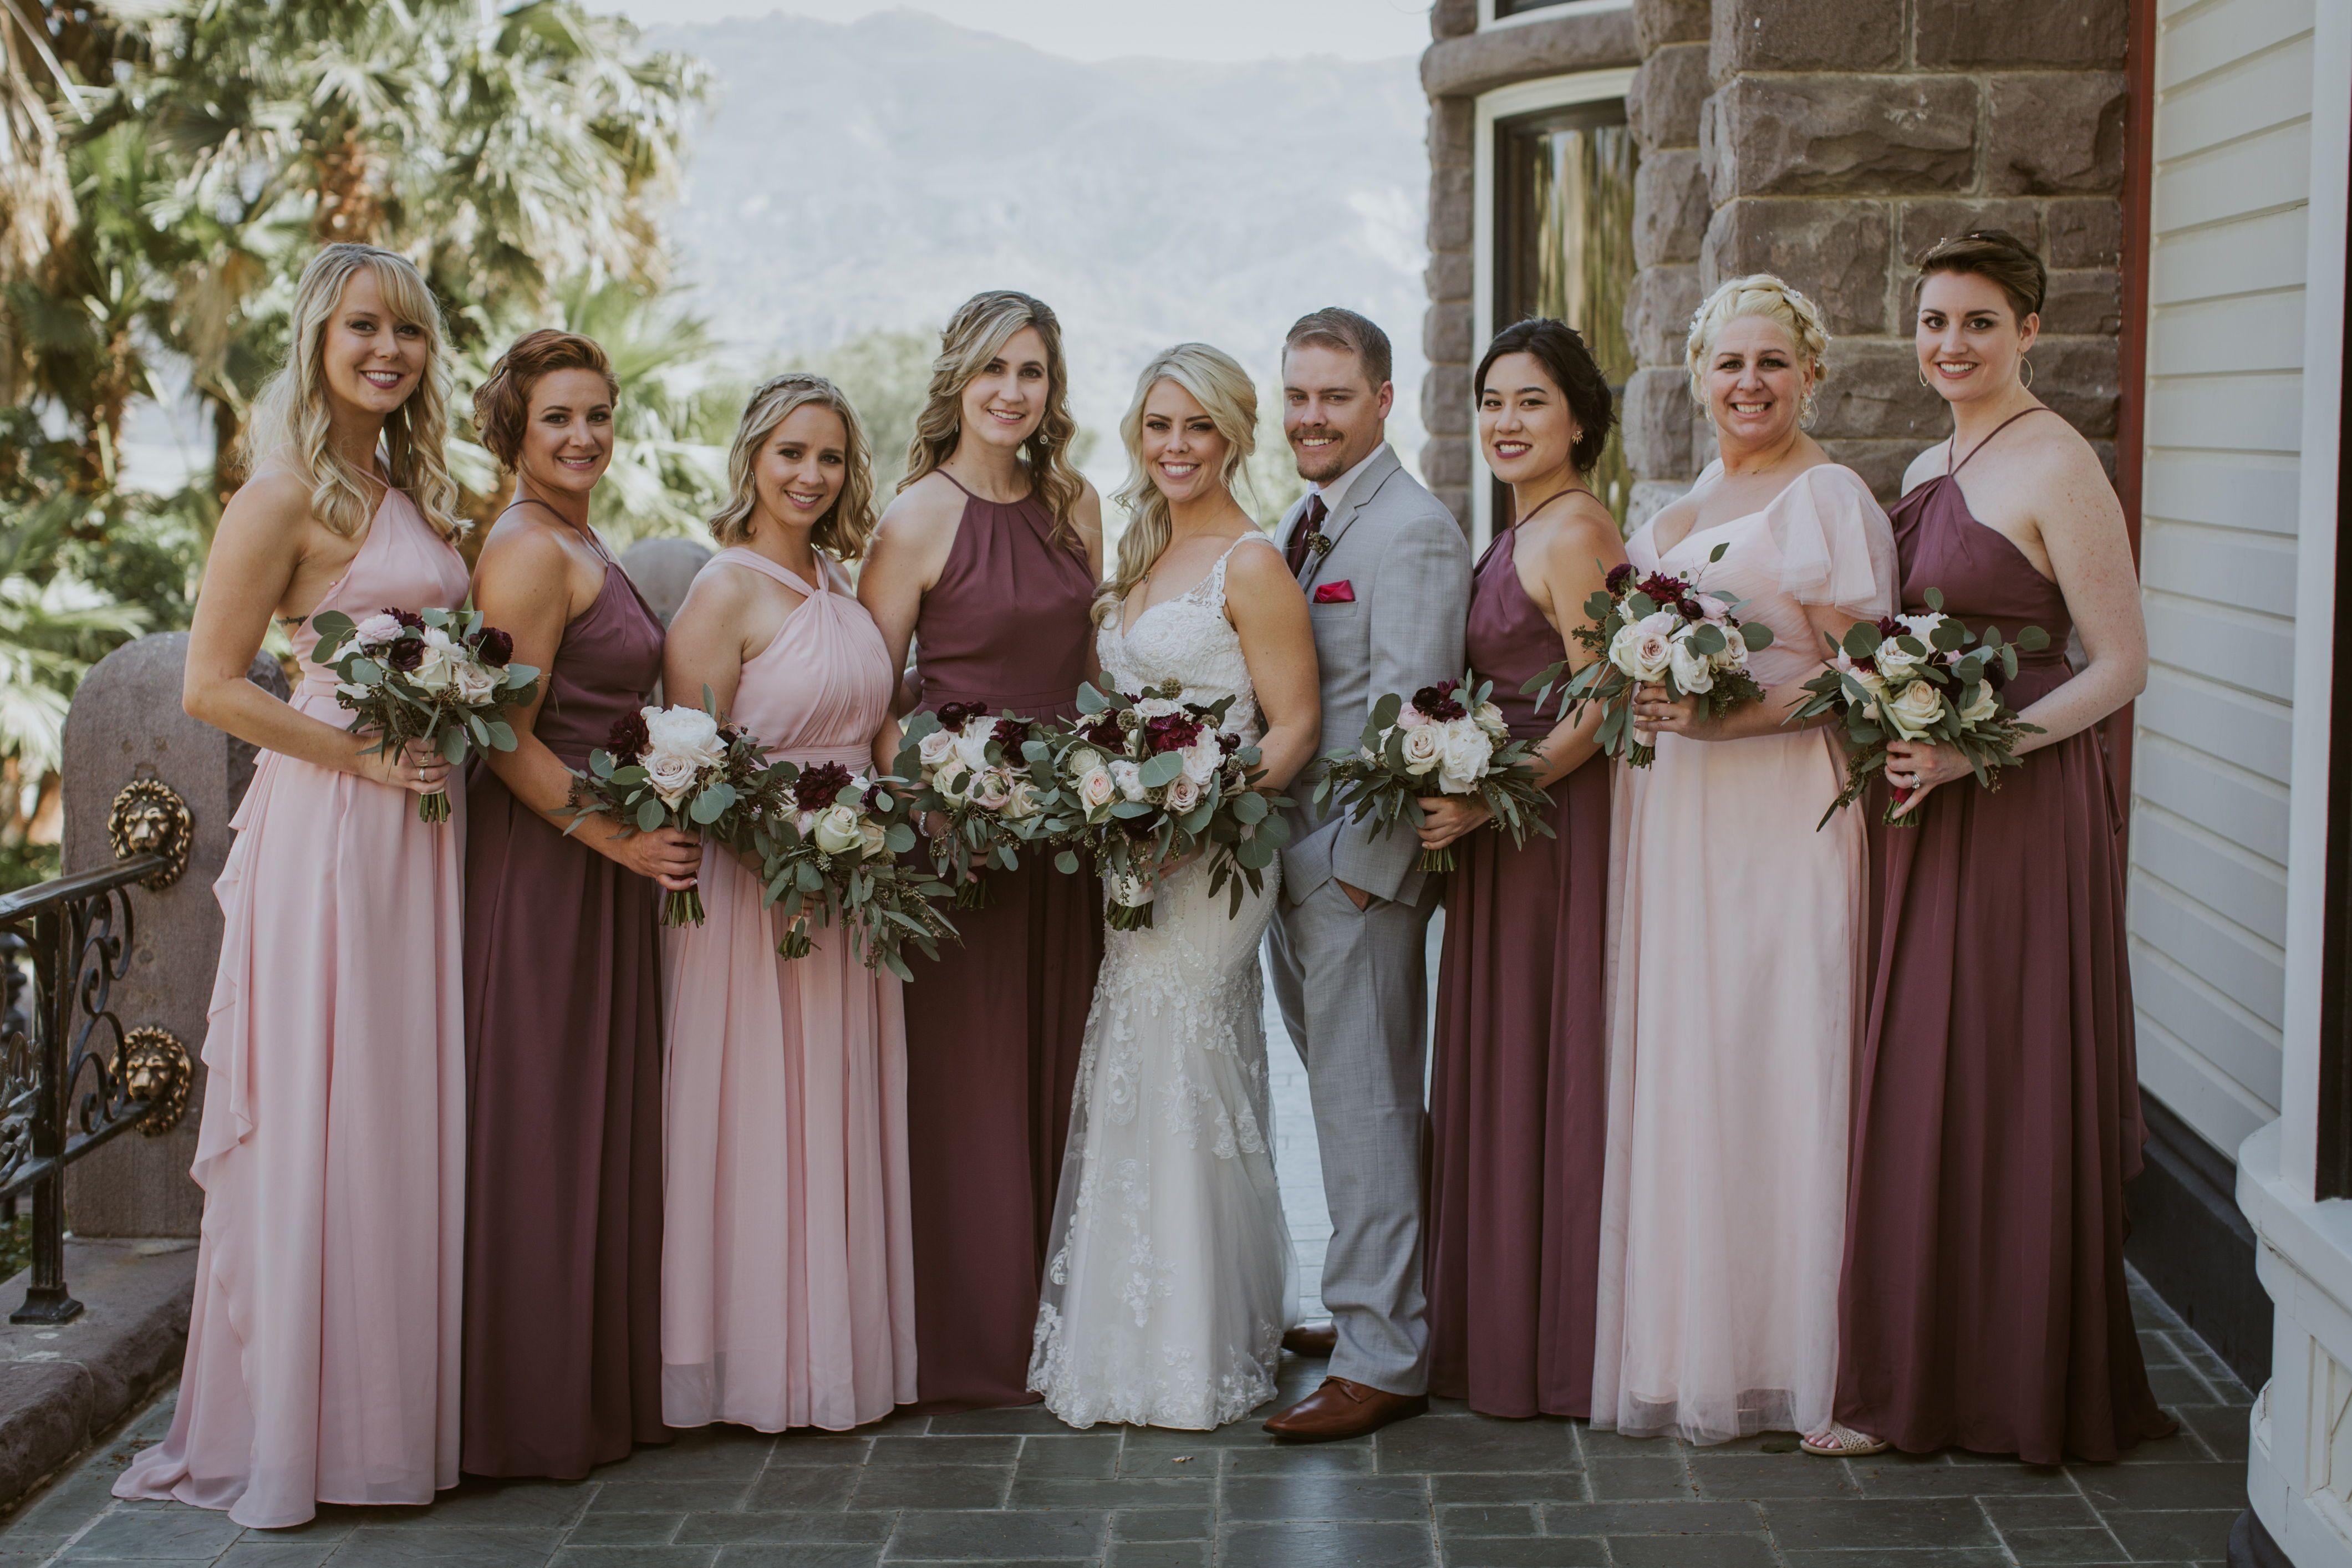 Pin On Bride And Bridesmaids